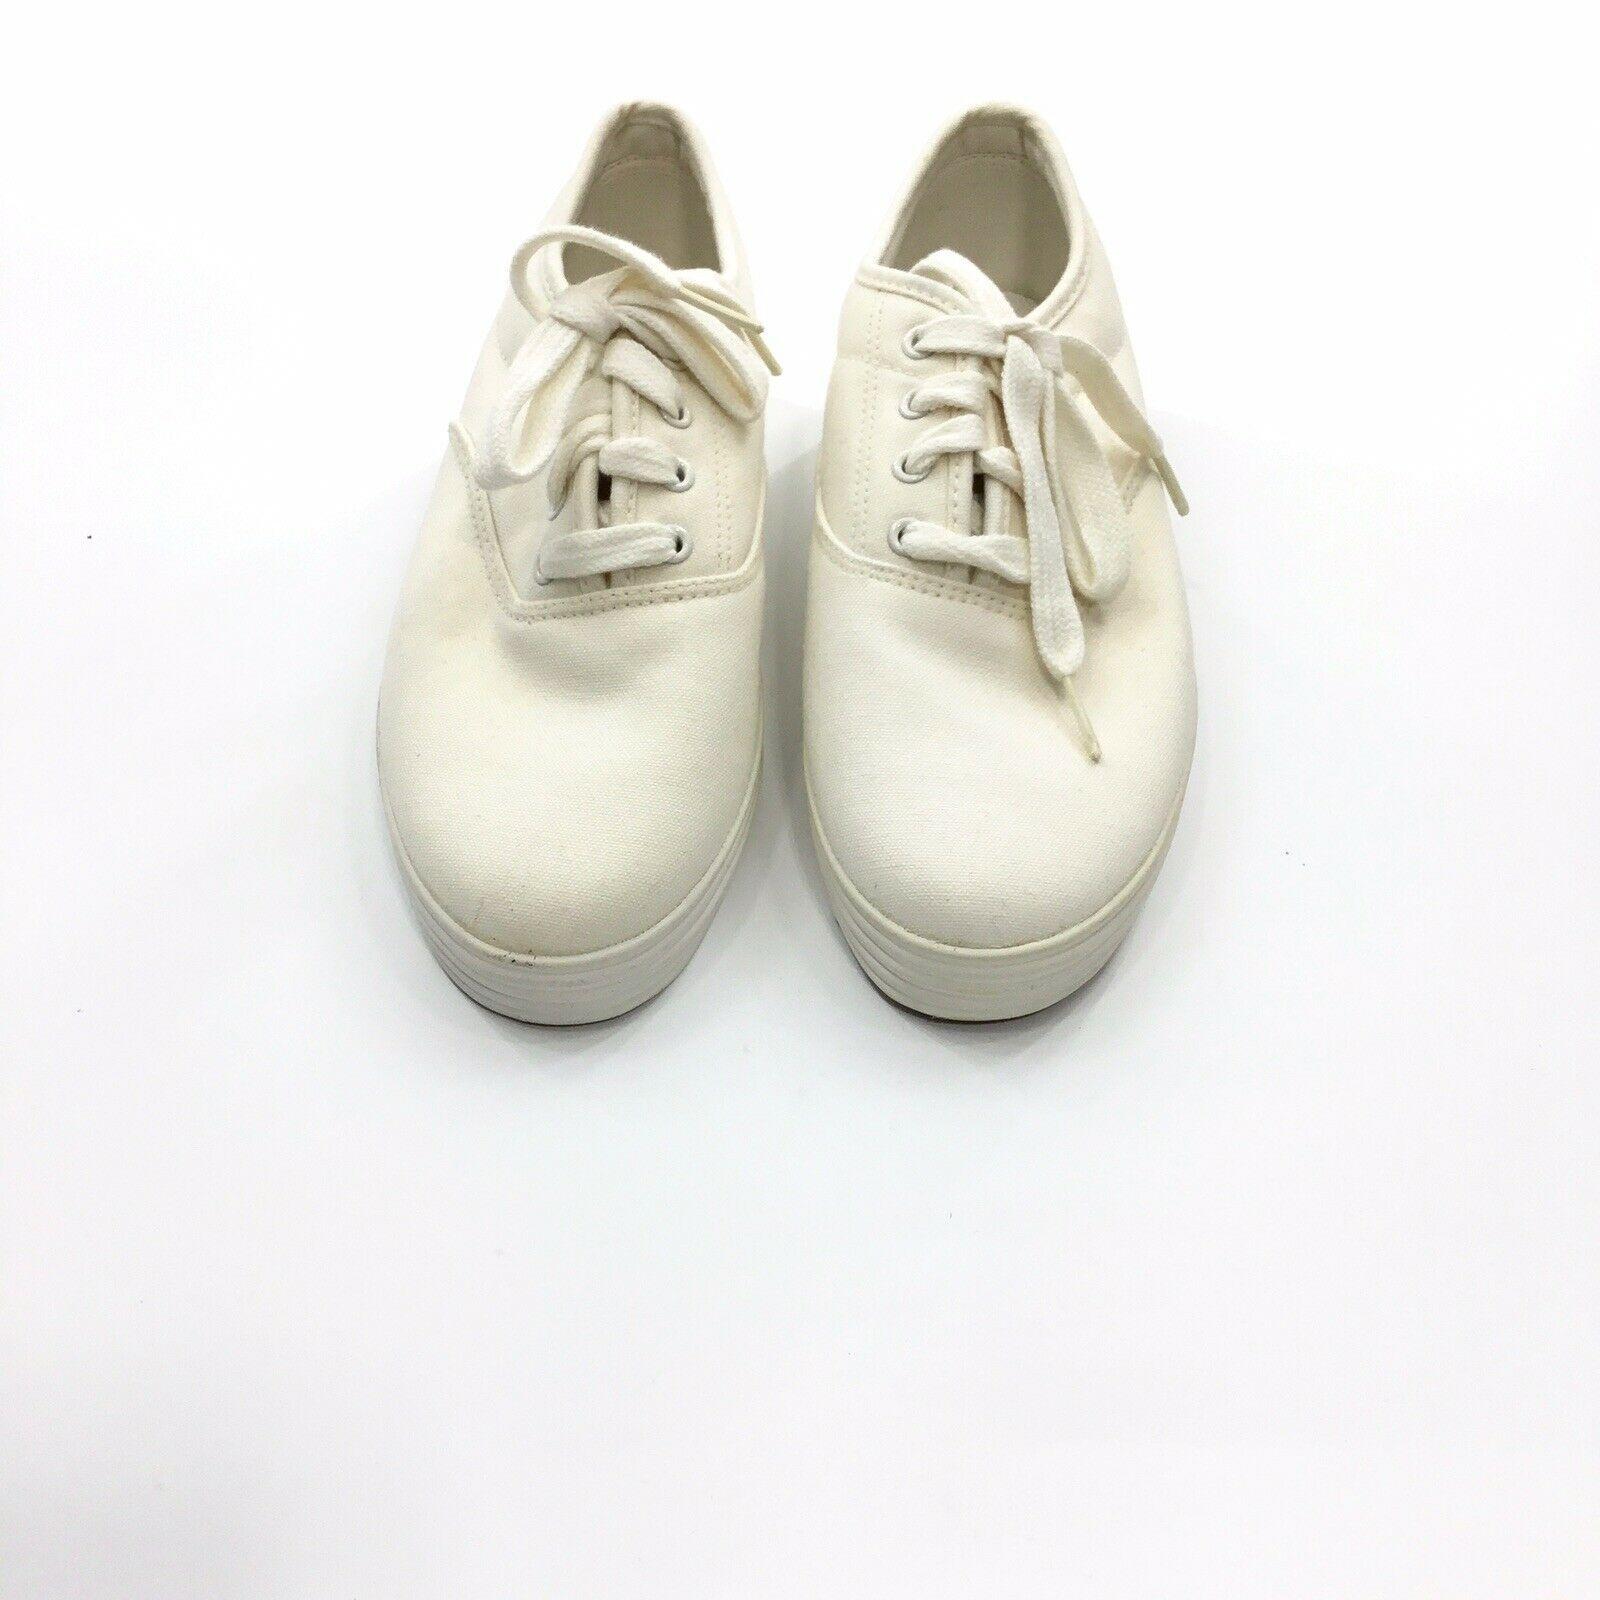 Aerosoles Women's Wally Ball White Sneakers 7.5M - $15.10